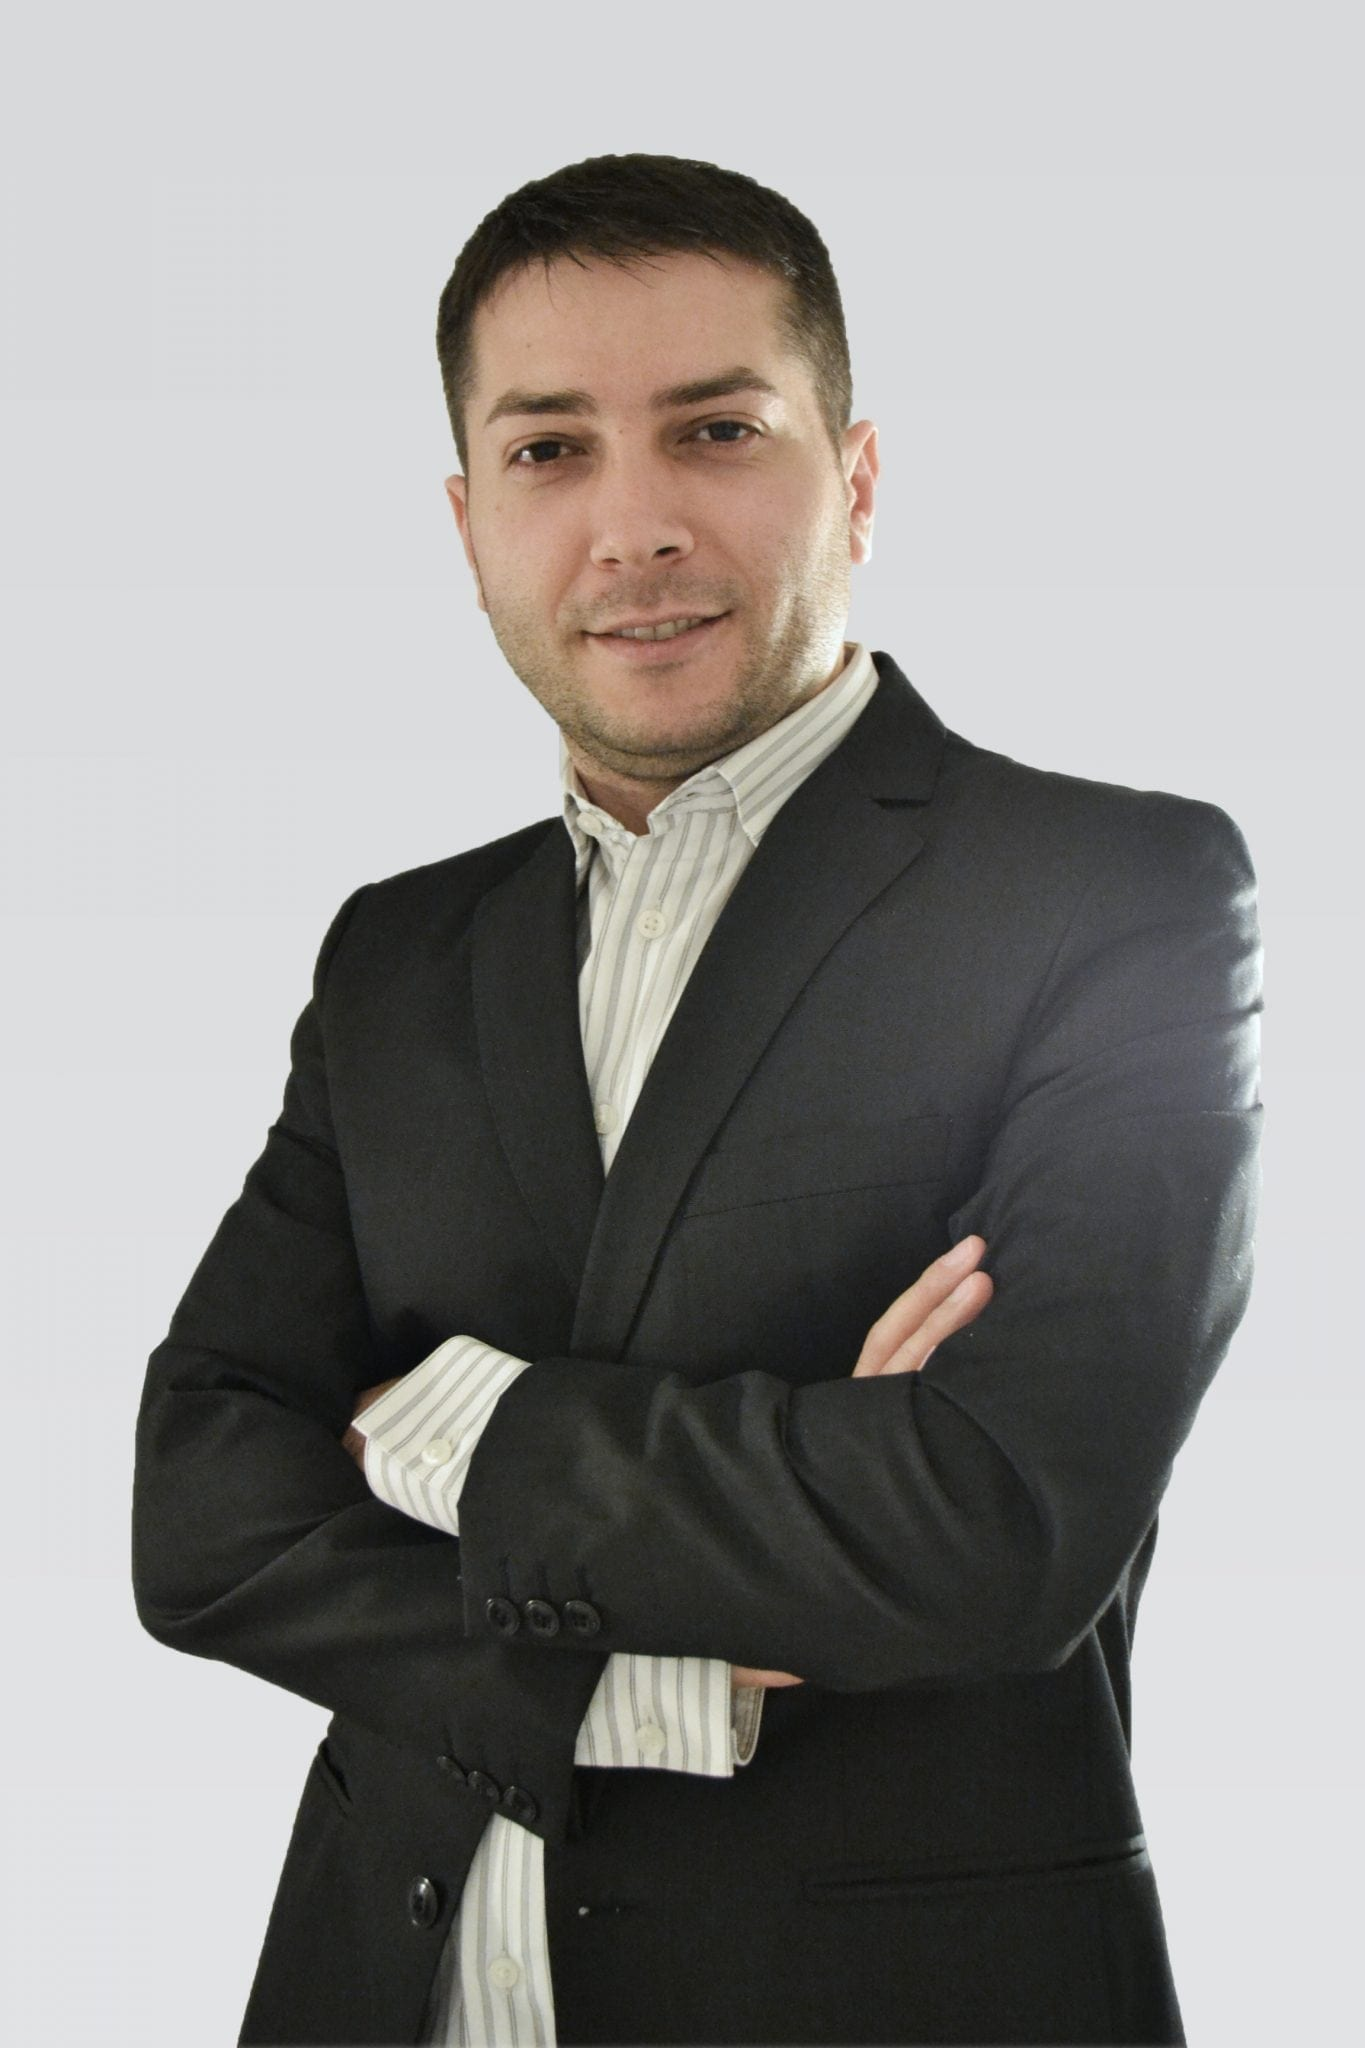 Cosmin_Dobranis_Country_Director_Mio_pentru România_si_ Ungaria